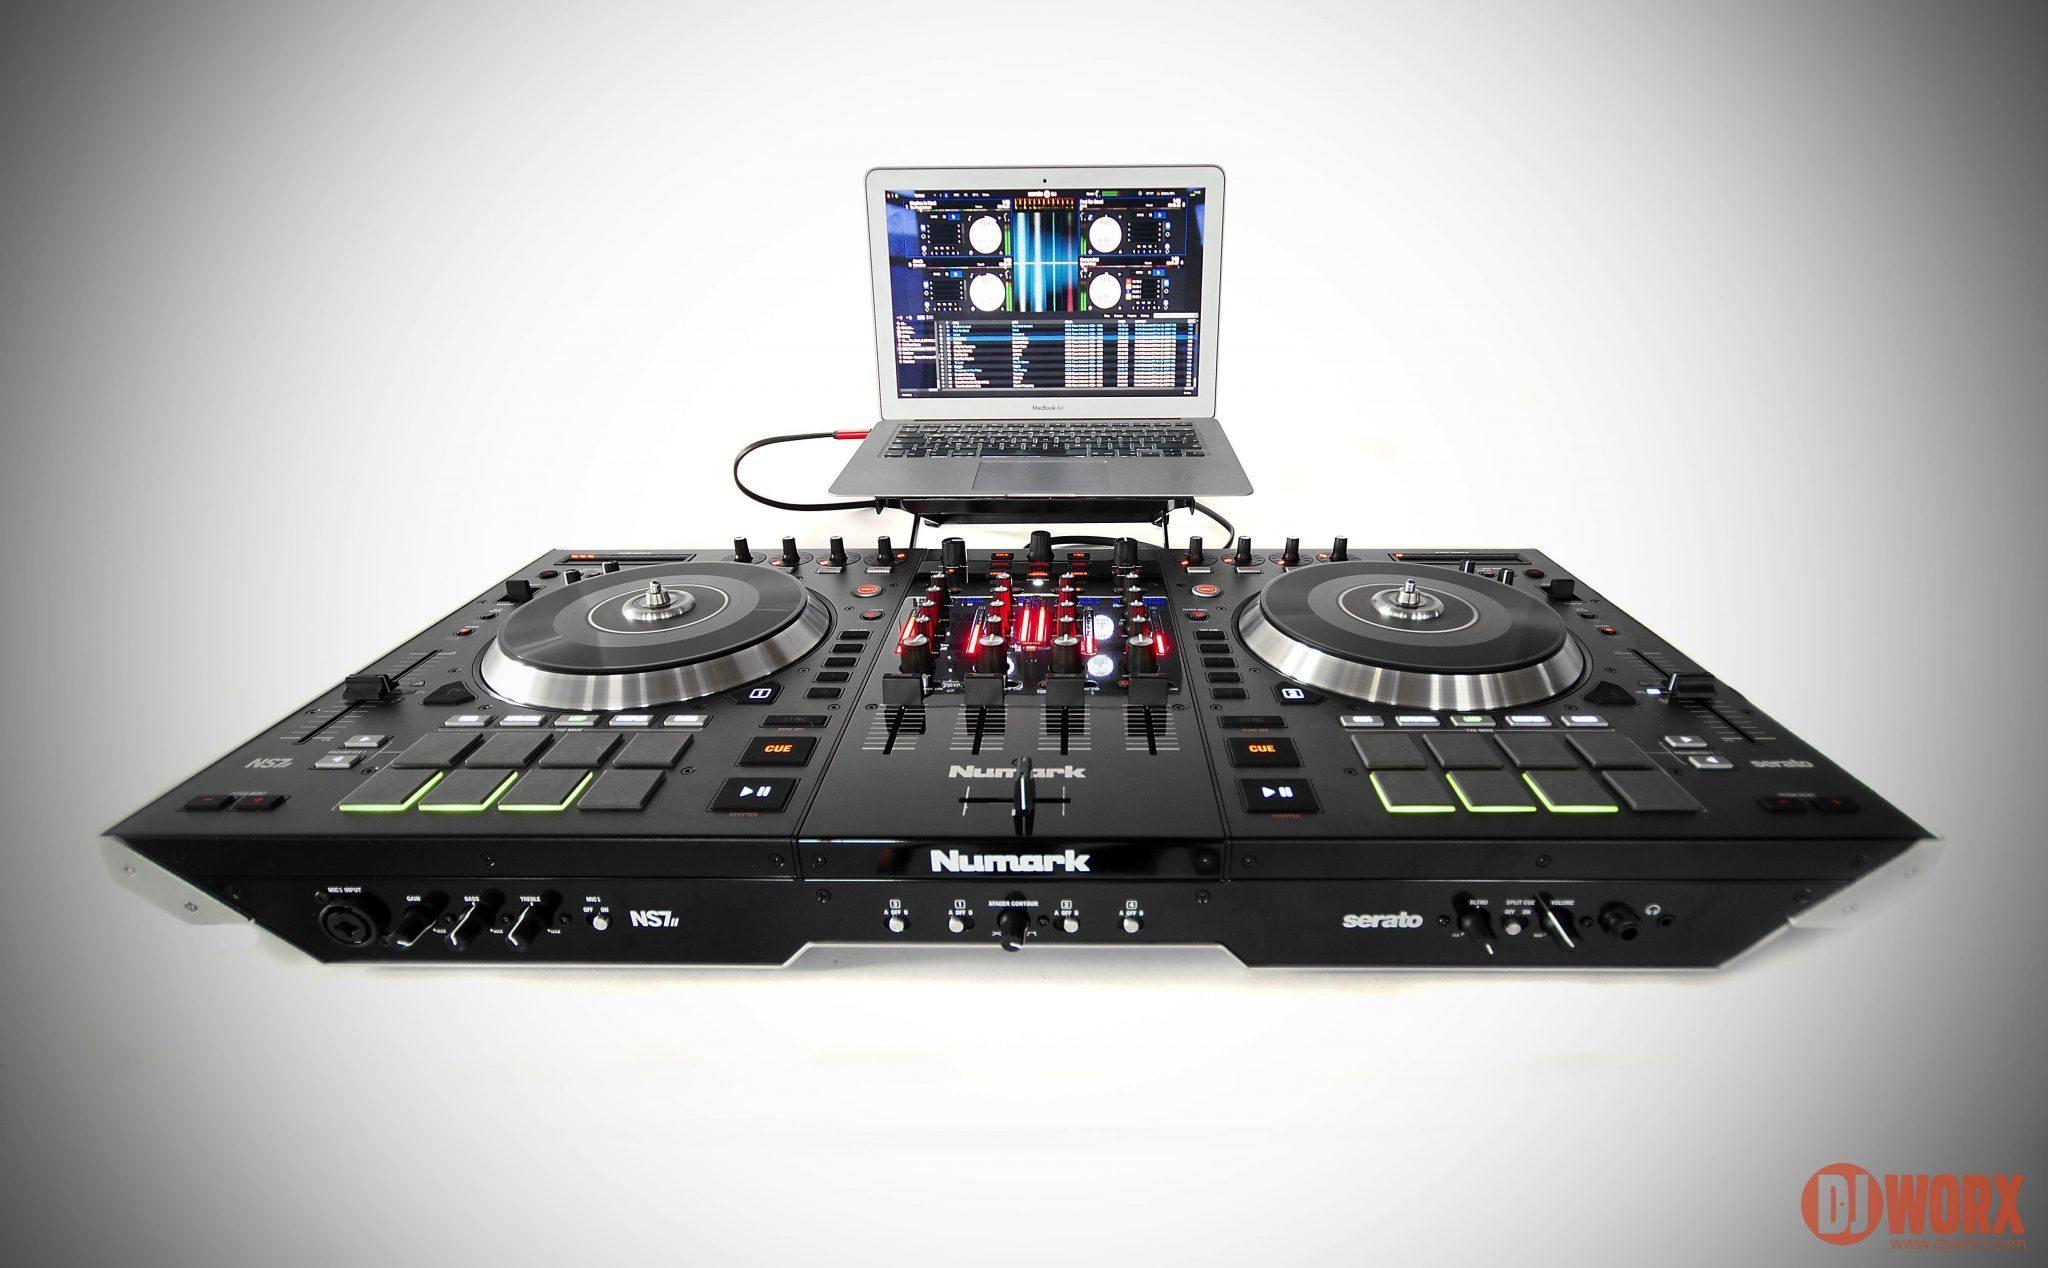 REVIEW: Numark NS7II Serato DJ Controller | DJWORX